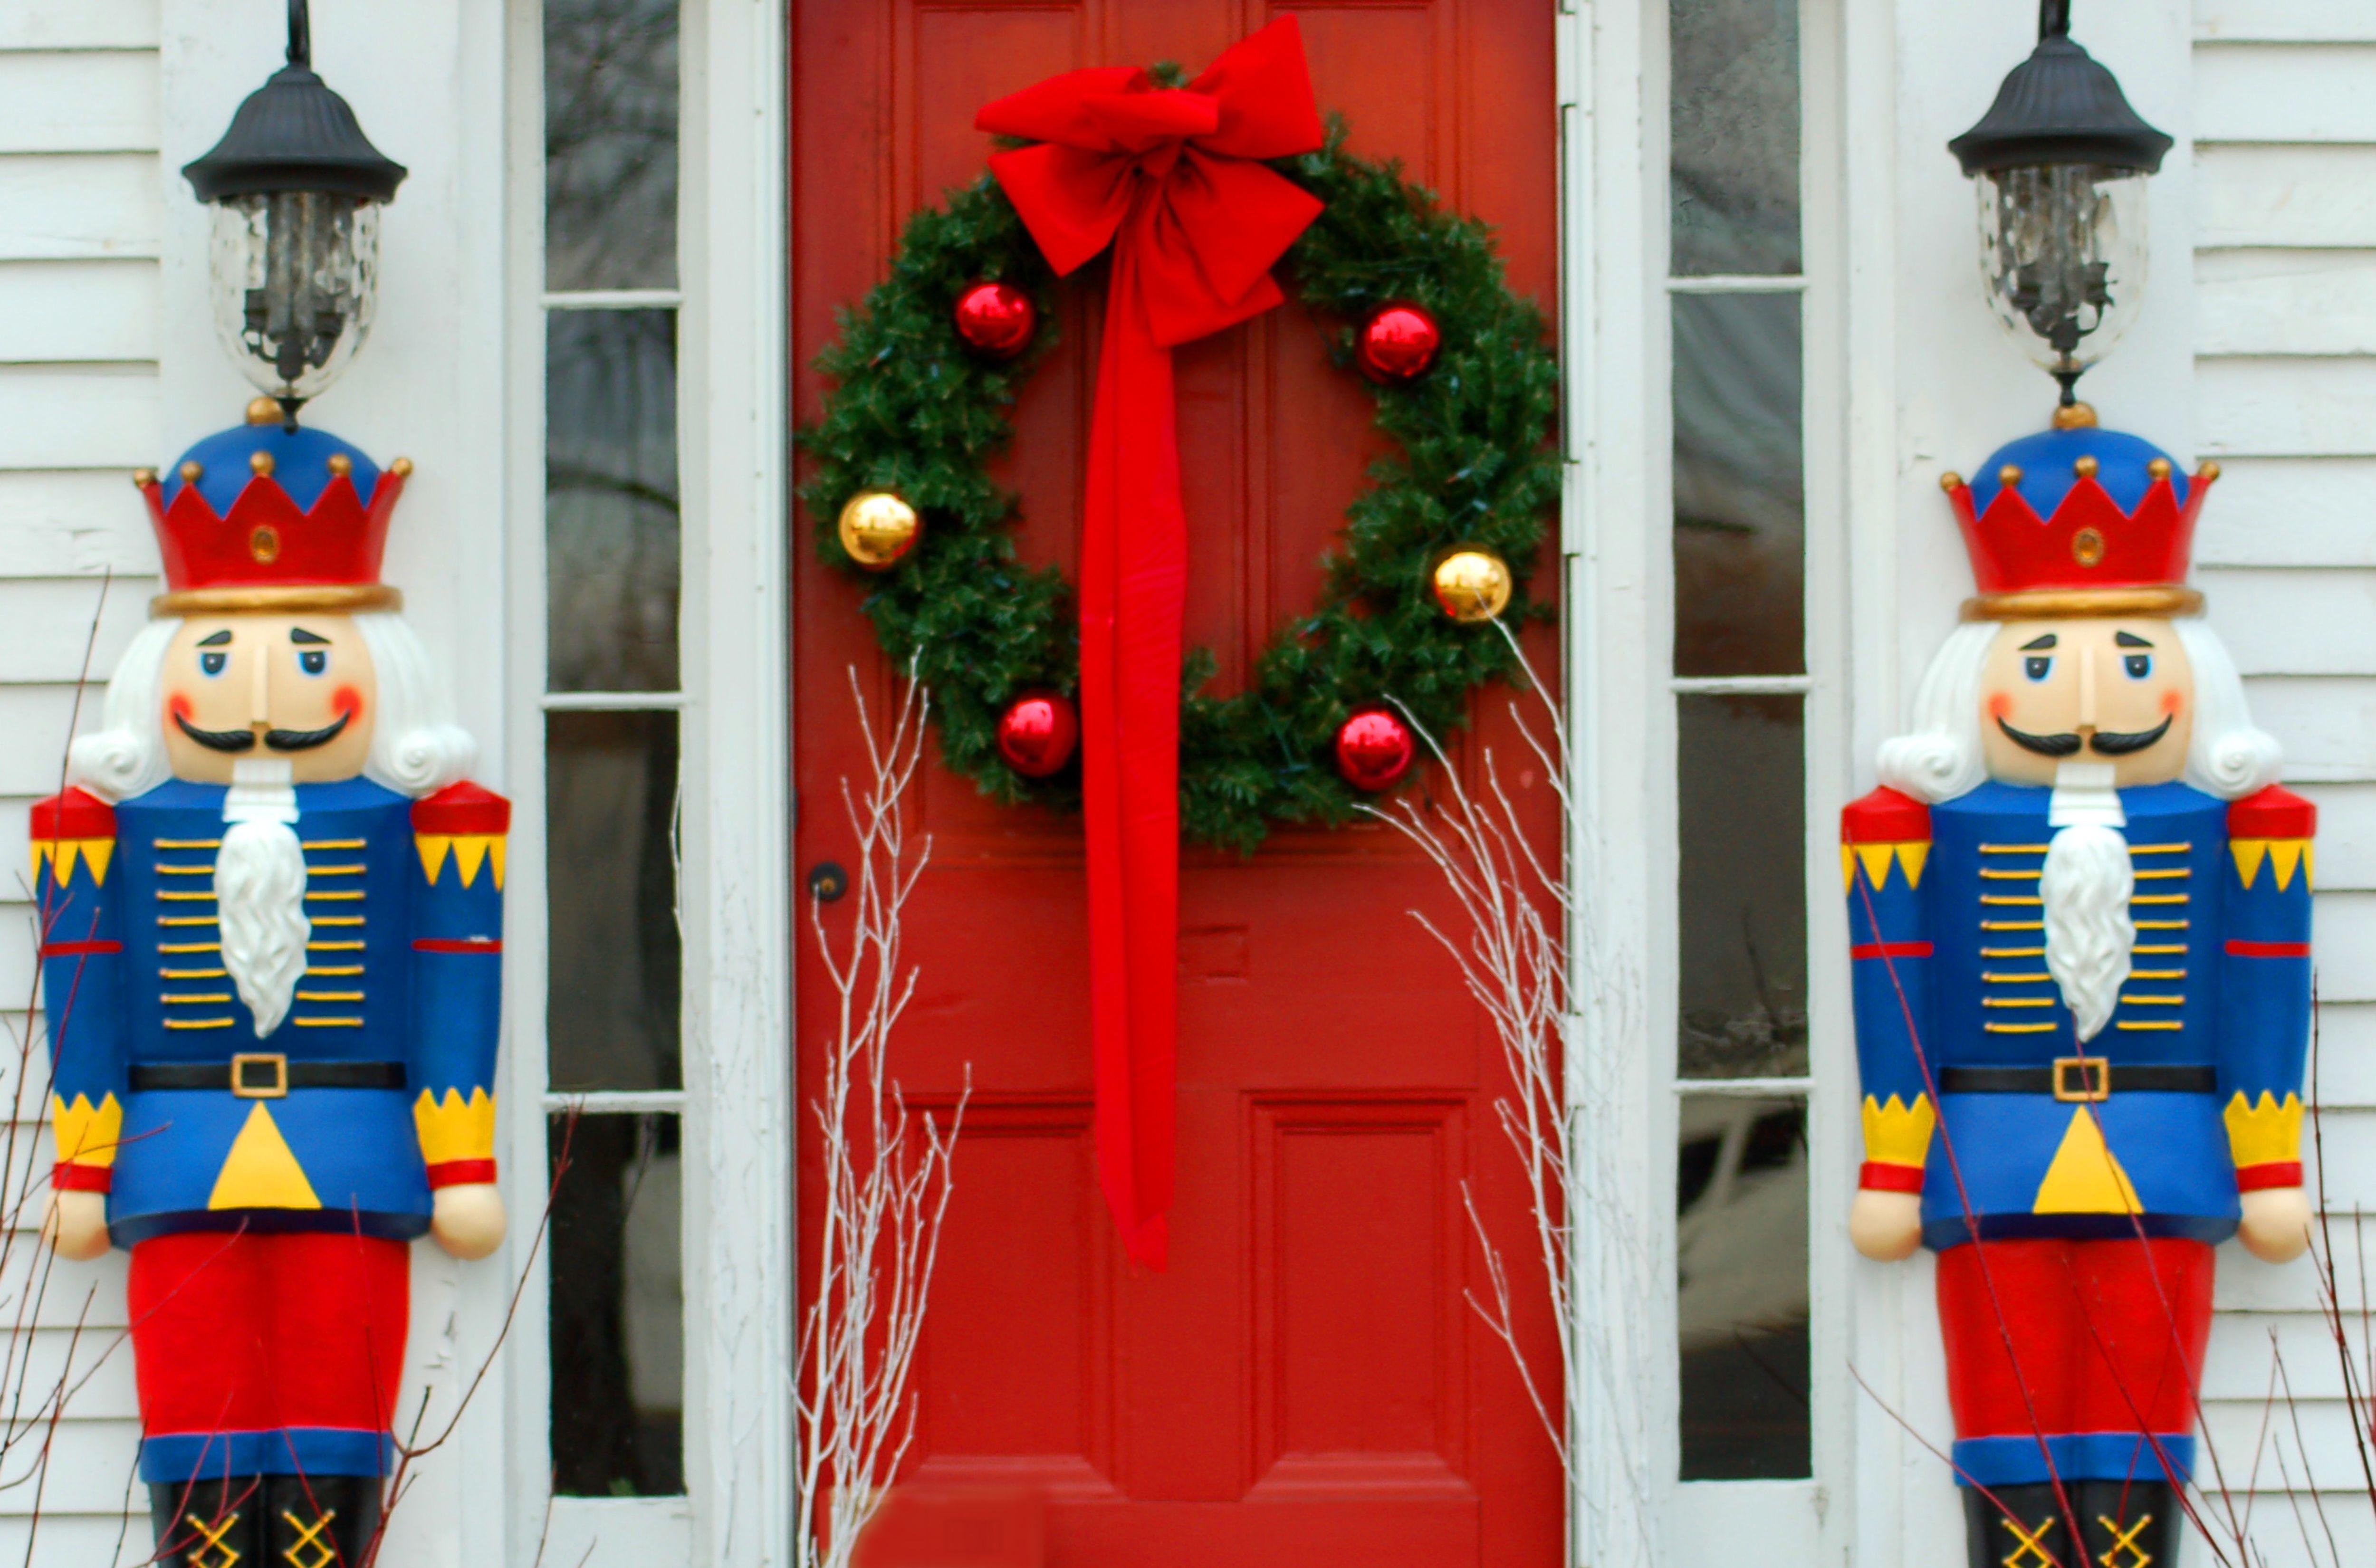 Fruit over the door christmas decoration - Fruit Over The Door Christmas Decoration 14